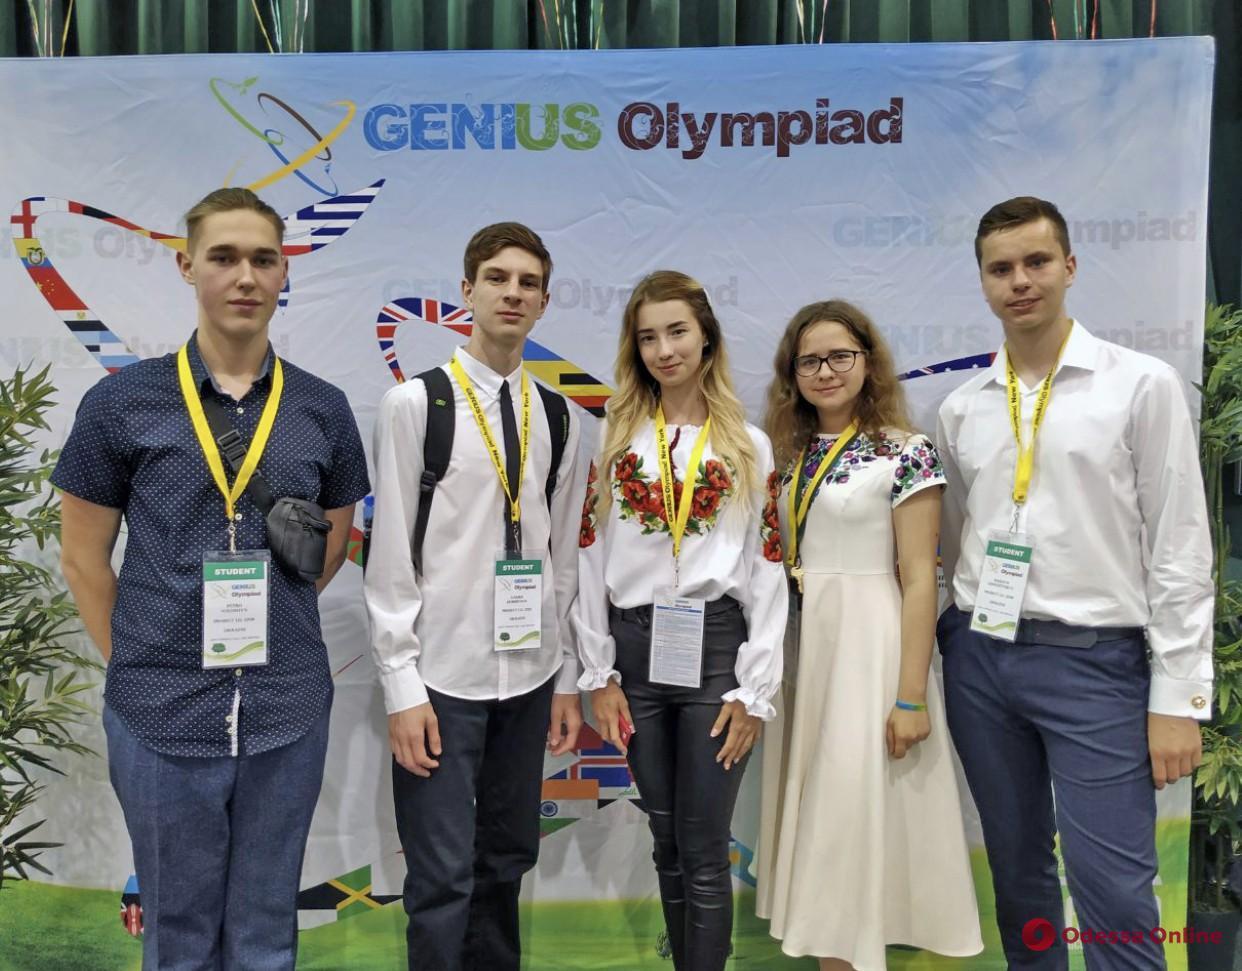 Одесситка заняла призовое место на олимпиаде гениев в США